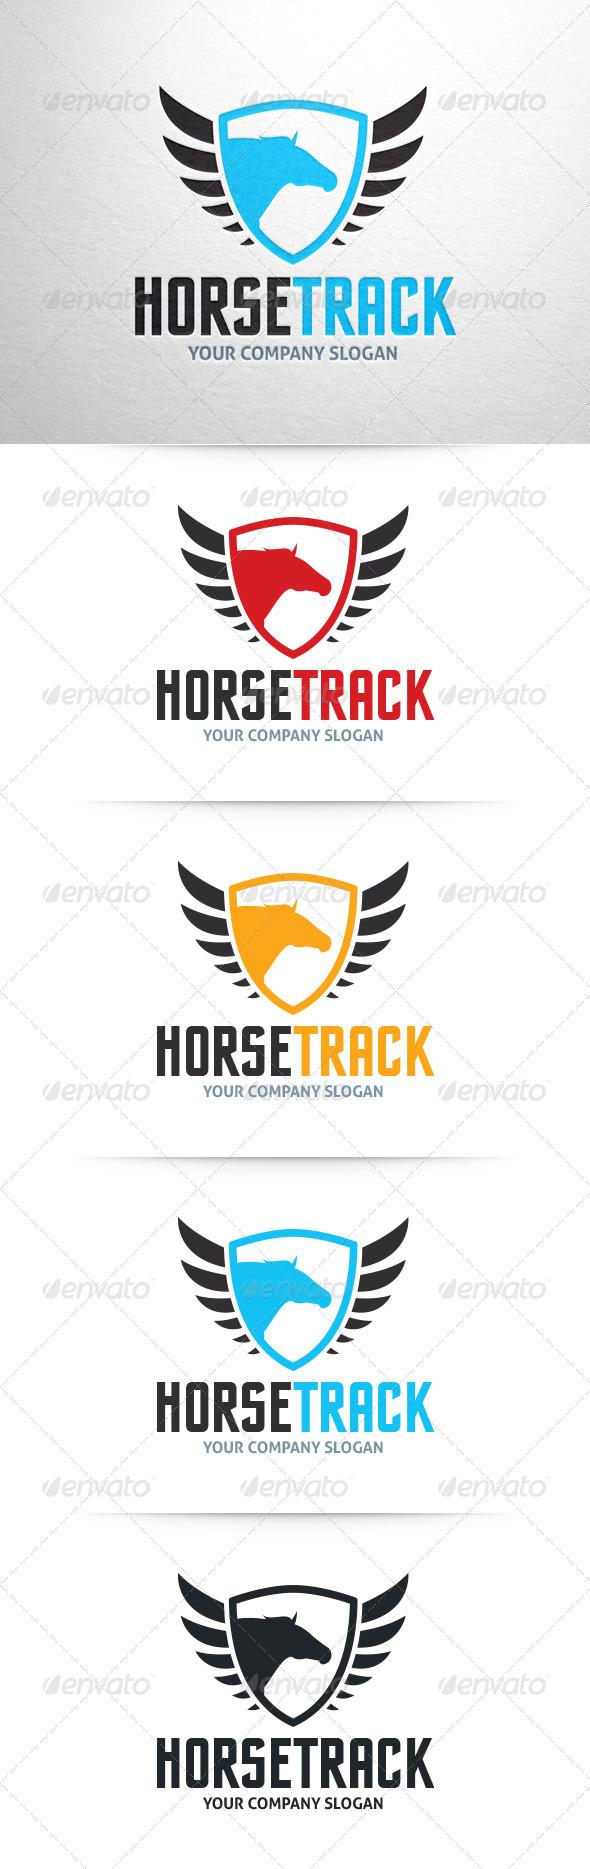 GraphicRiver Horse Track Logo Template 6513343